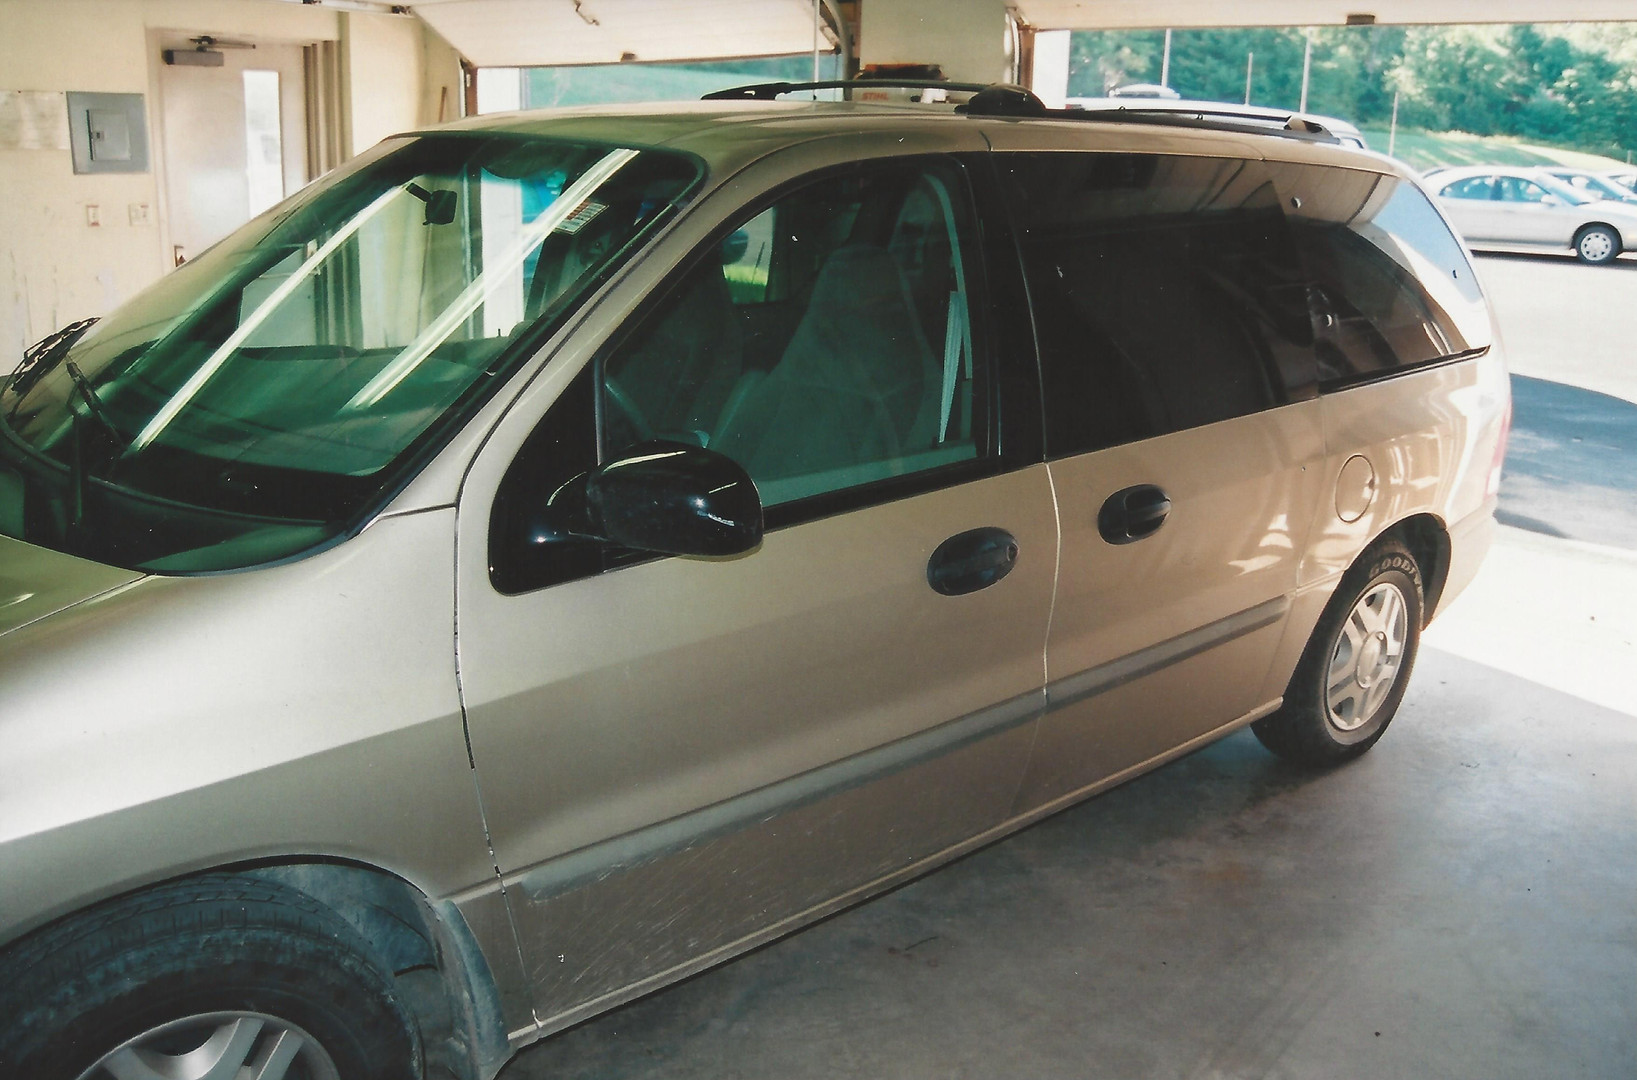 Michele's van